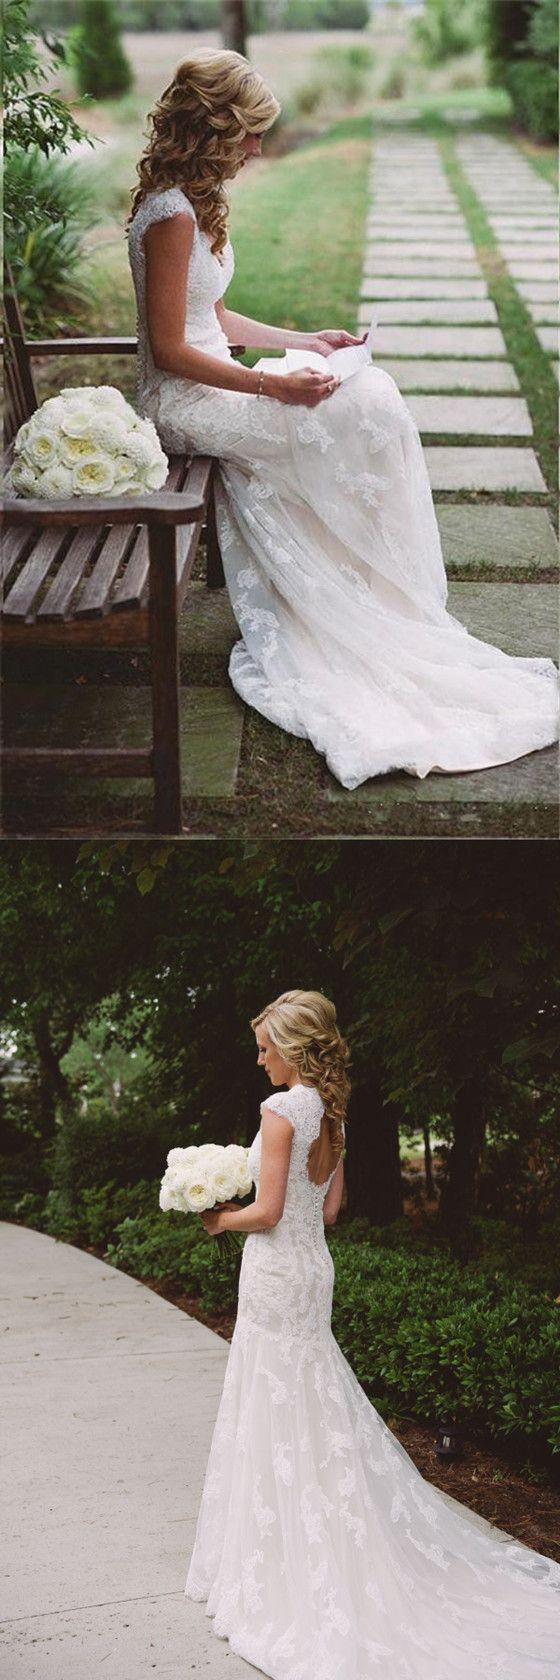 Lace wedding dress open back mermaid  New Romantic Mermaid Cap Sleeves Lace Vneck Openback Long Wedding